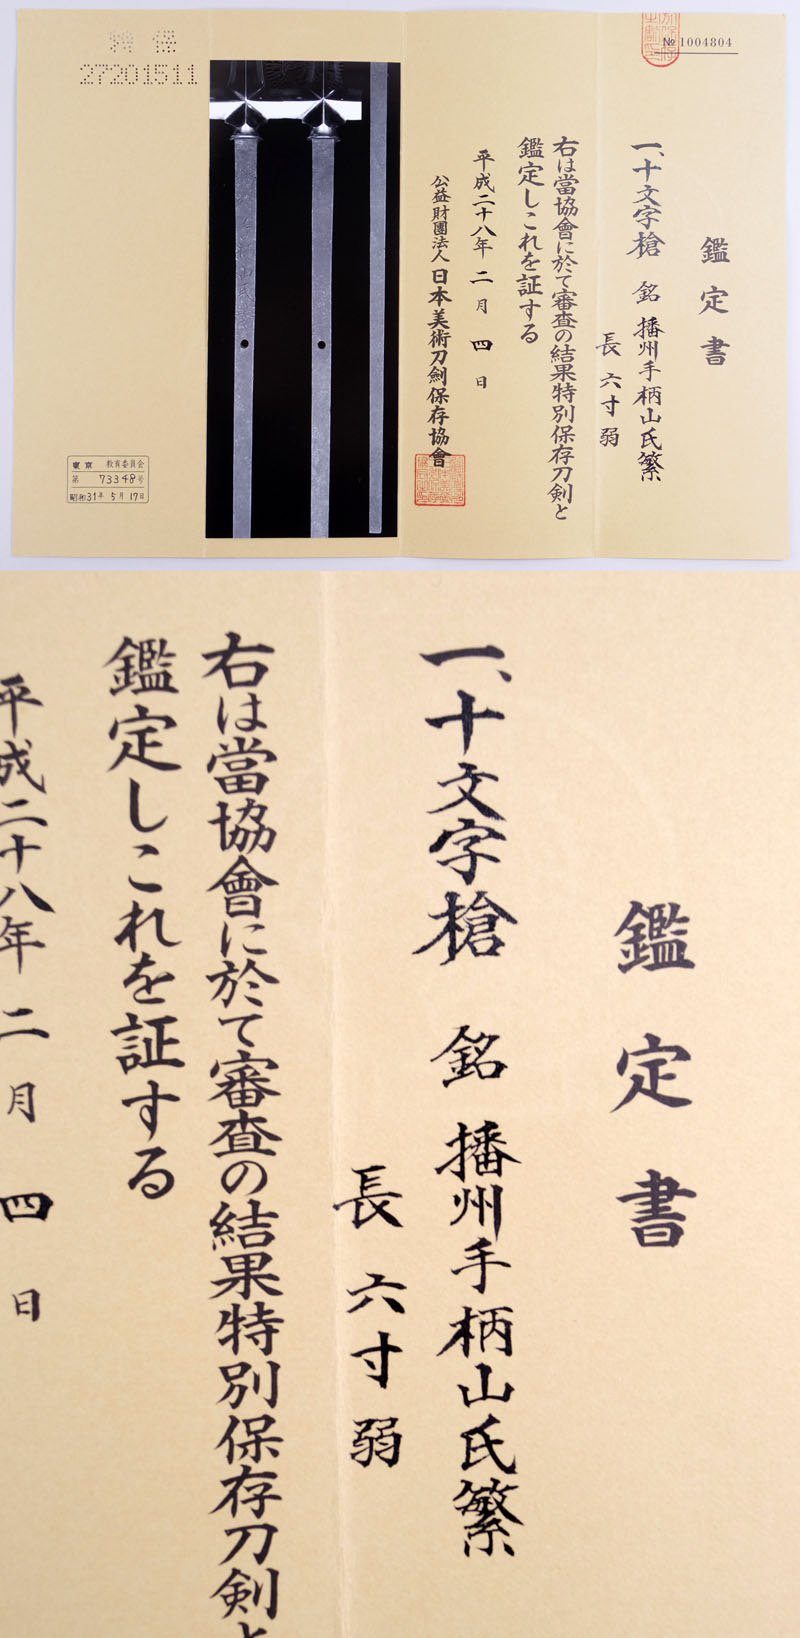 播州手柄山氏繁(二代) Picture of Certificate